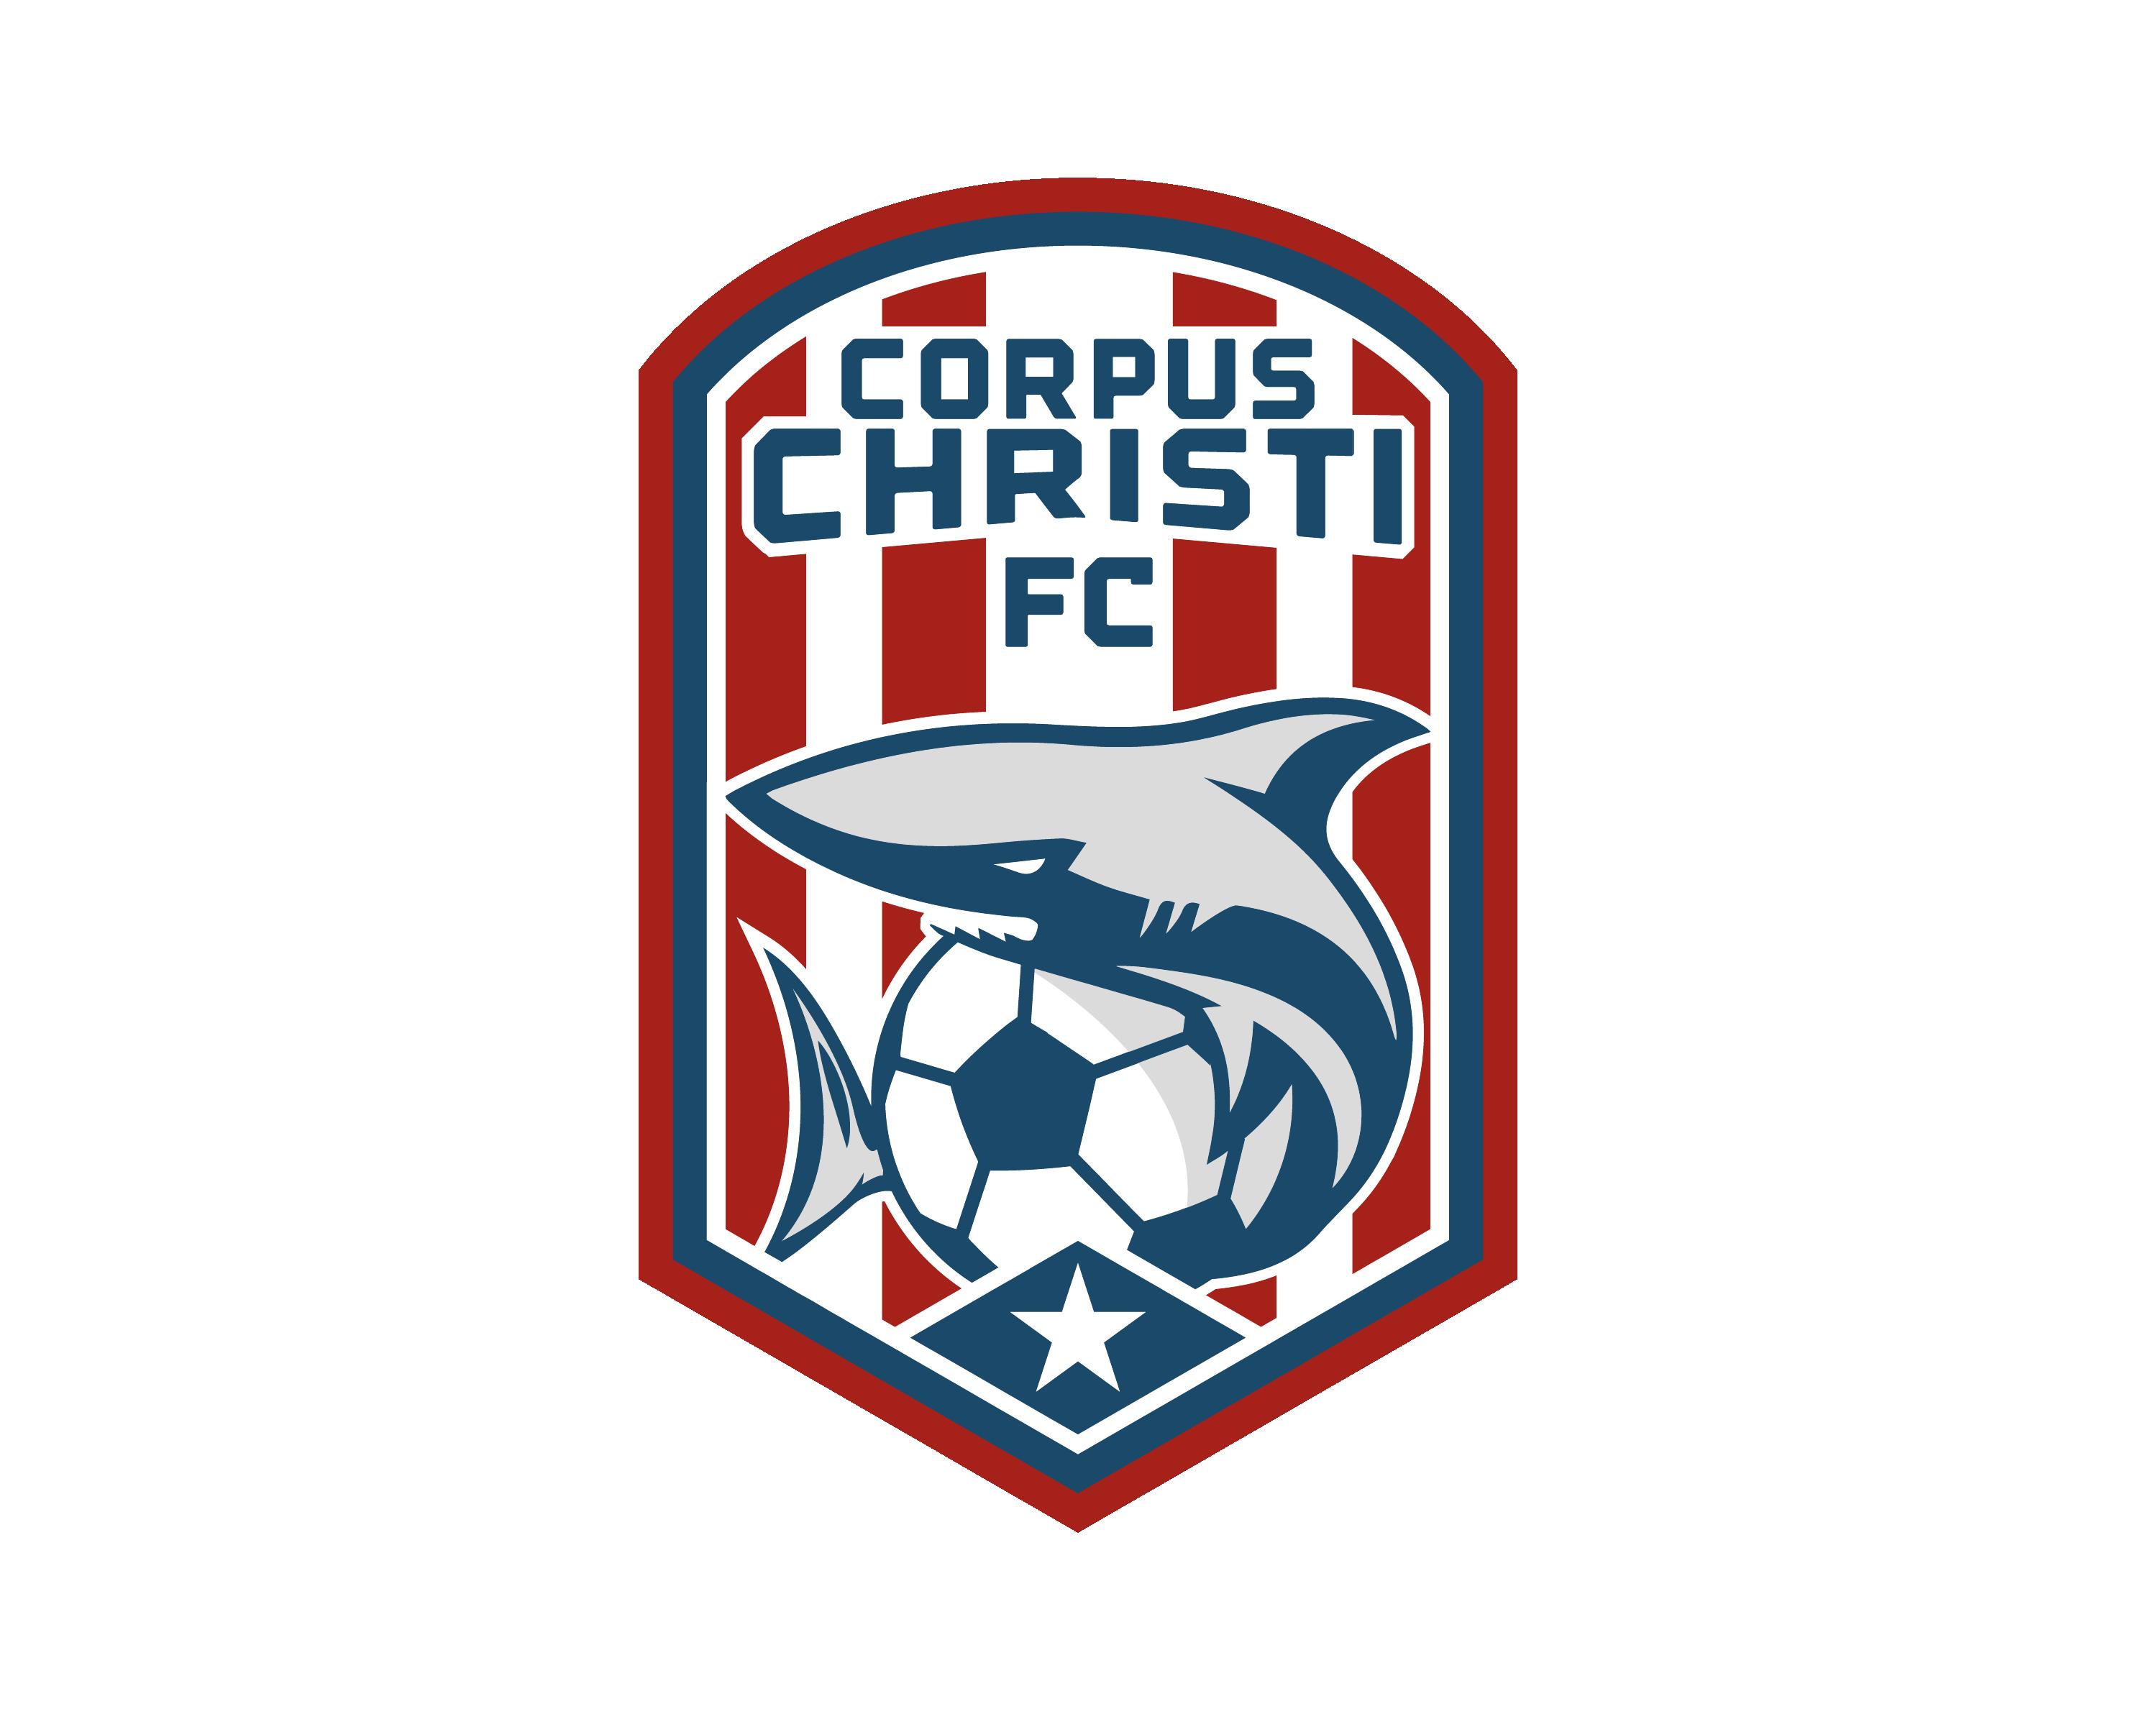 Corpus Christi FC